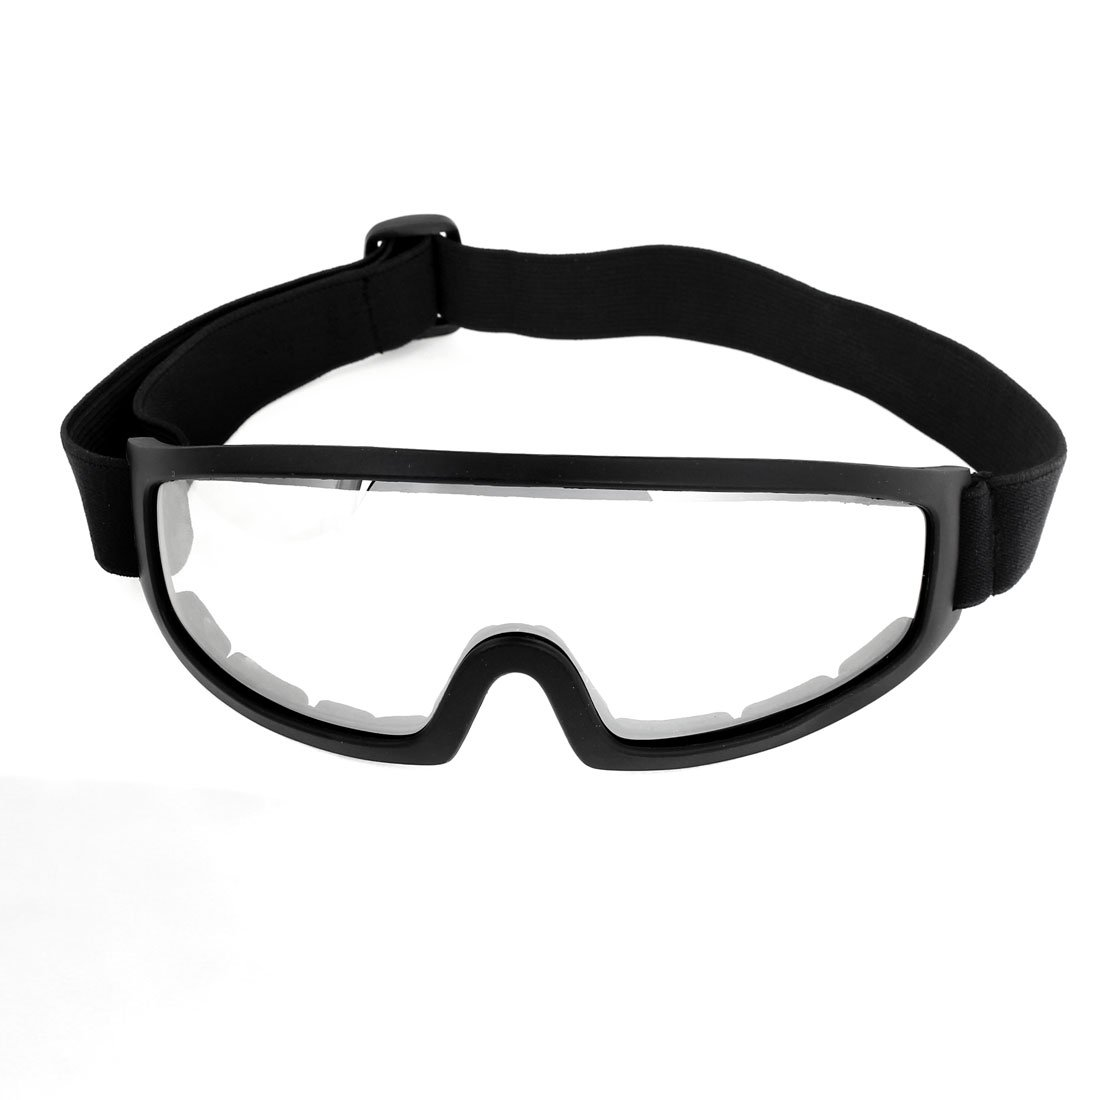 Black Plastic Frame Design Rim Clear Lens Ski Goggles Sunglasses юбка с цветочным рисунком и воланом 25% шелка